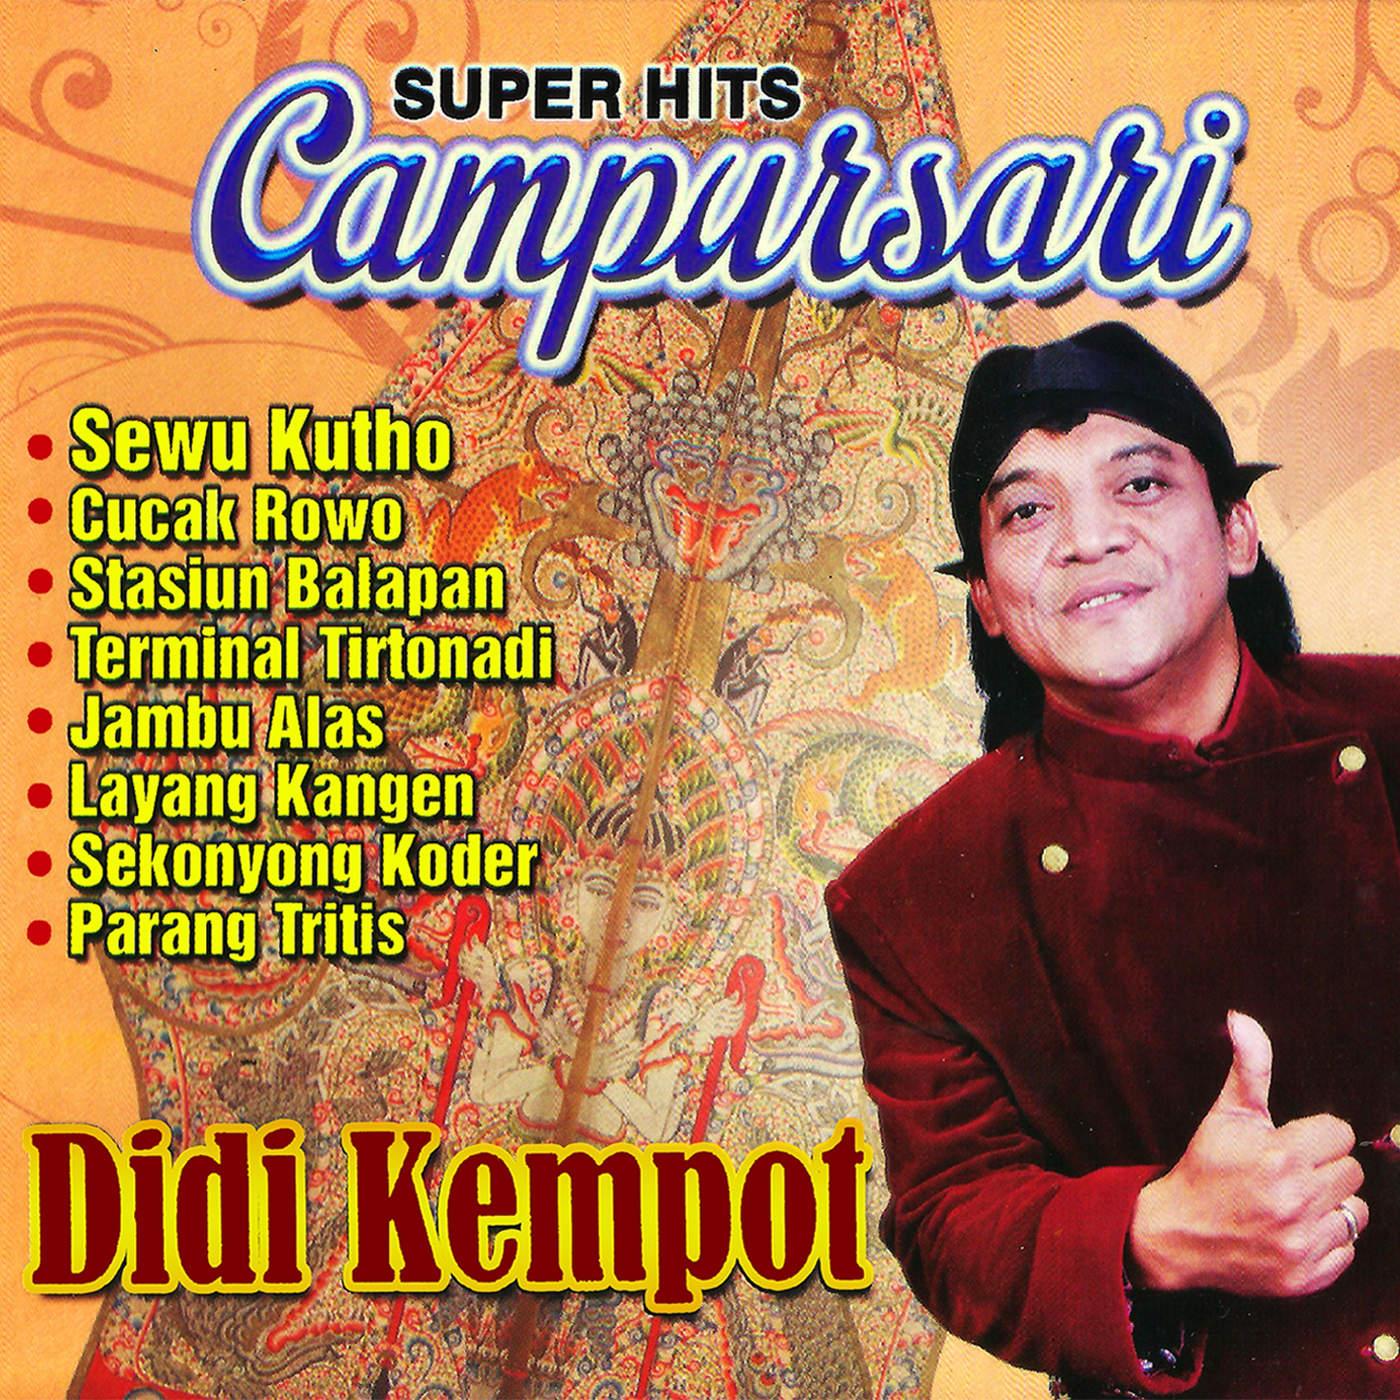 Didi Kempot - Superhits Campursari - Album (2015) [iTunes Plus AAC M4A]